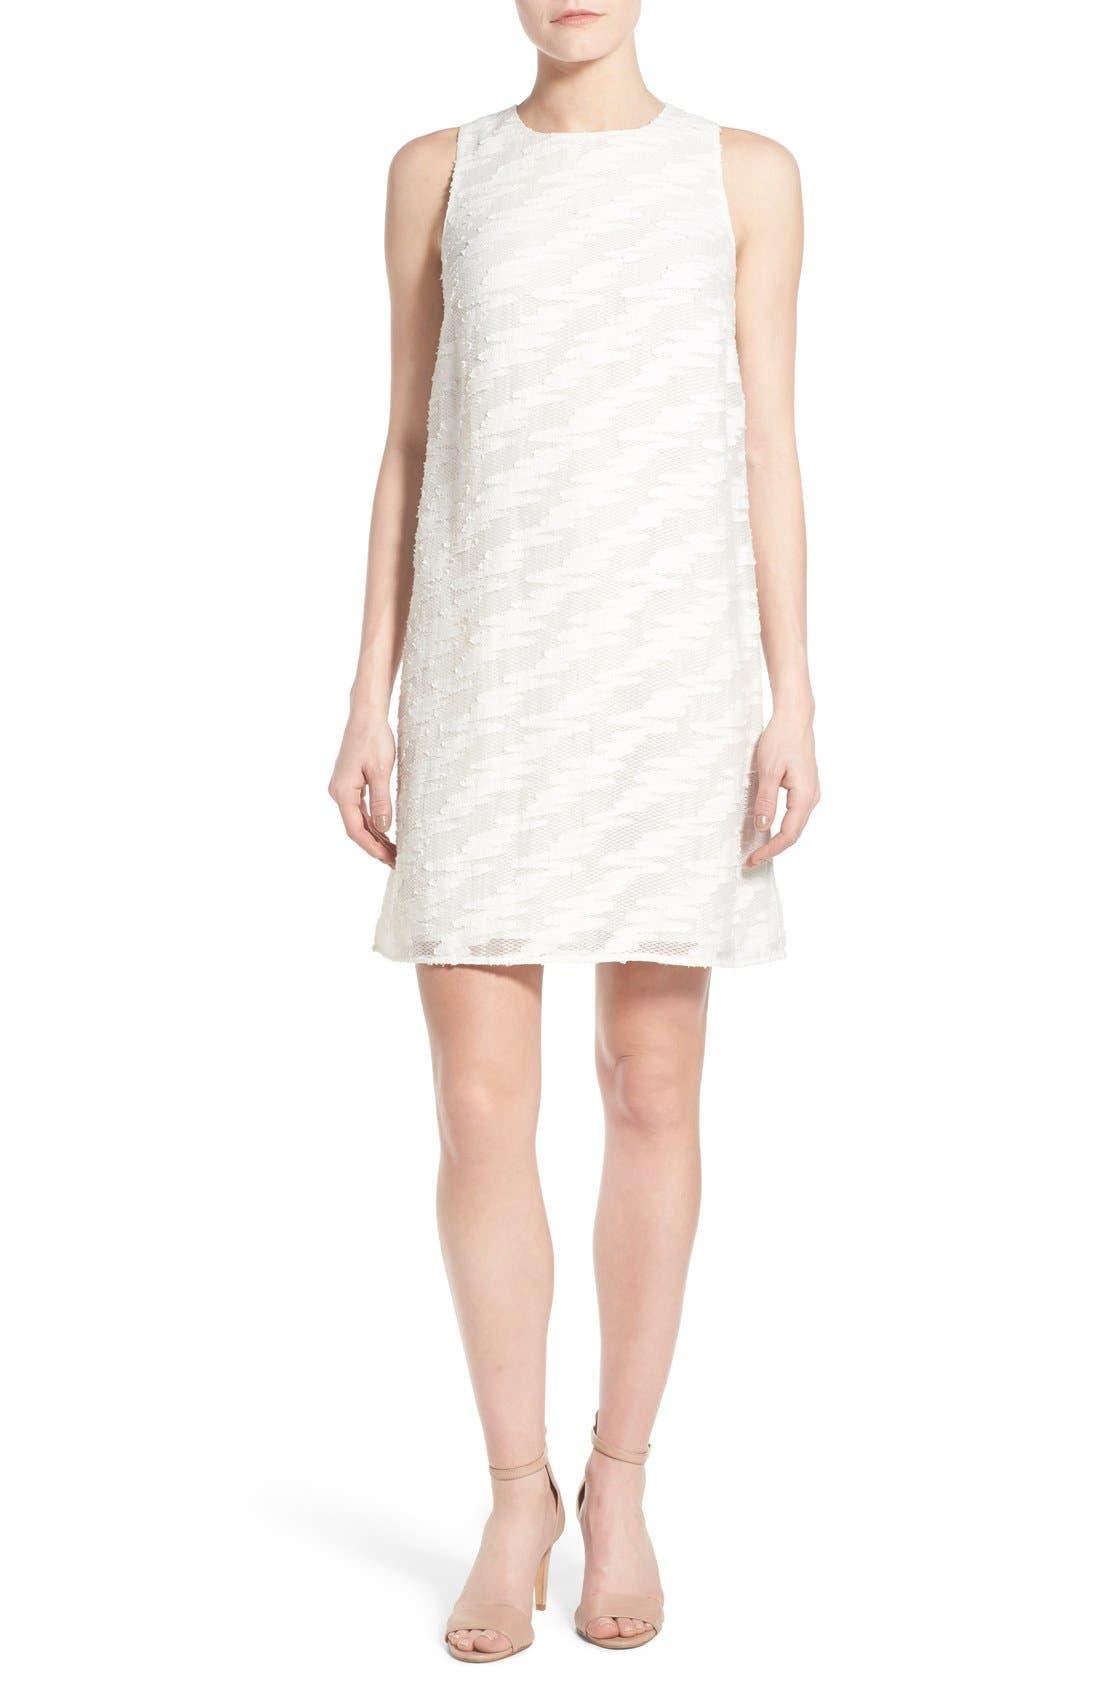 Alternate Image 1 Selected - Halogen® Lace Detail Sheath Dress (Regular & Petite)